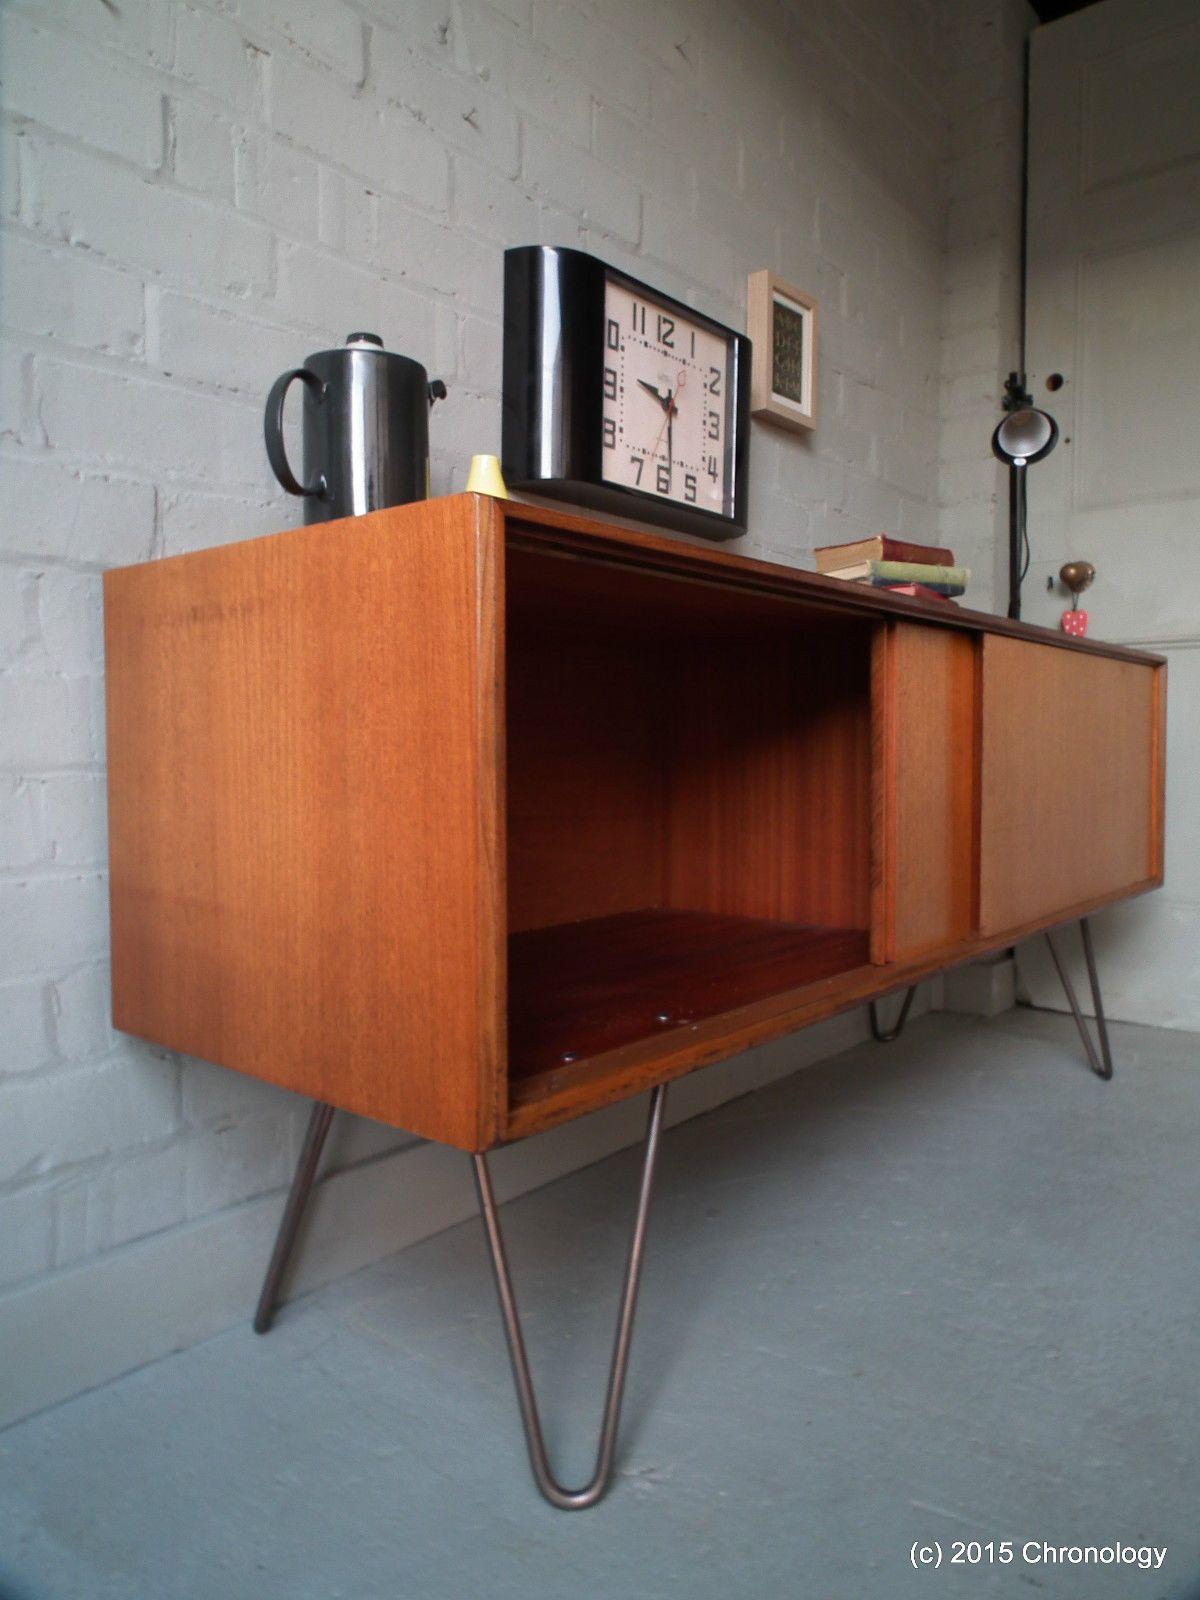 Vintage Retro Teak 60s G Plan Sideboard Industrial Hairpin Legs Danish Nathan Ebay Furniture Ideas G Plan Sideboard Sideboard Furniture